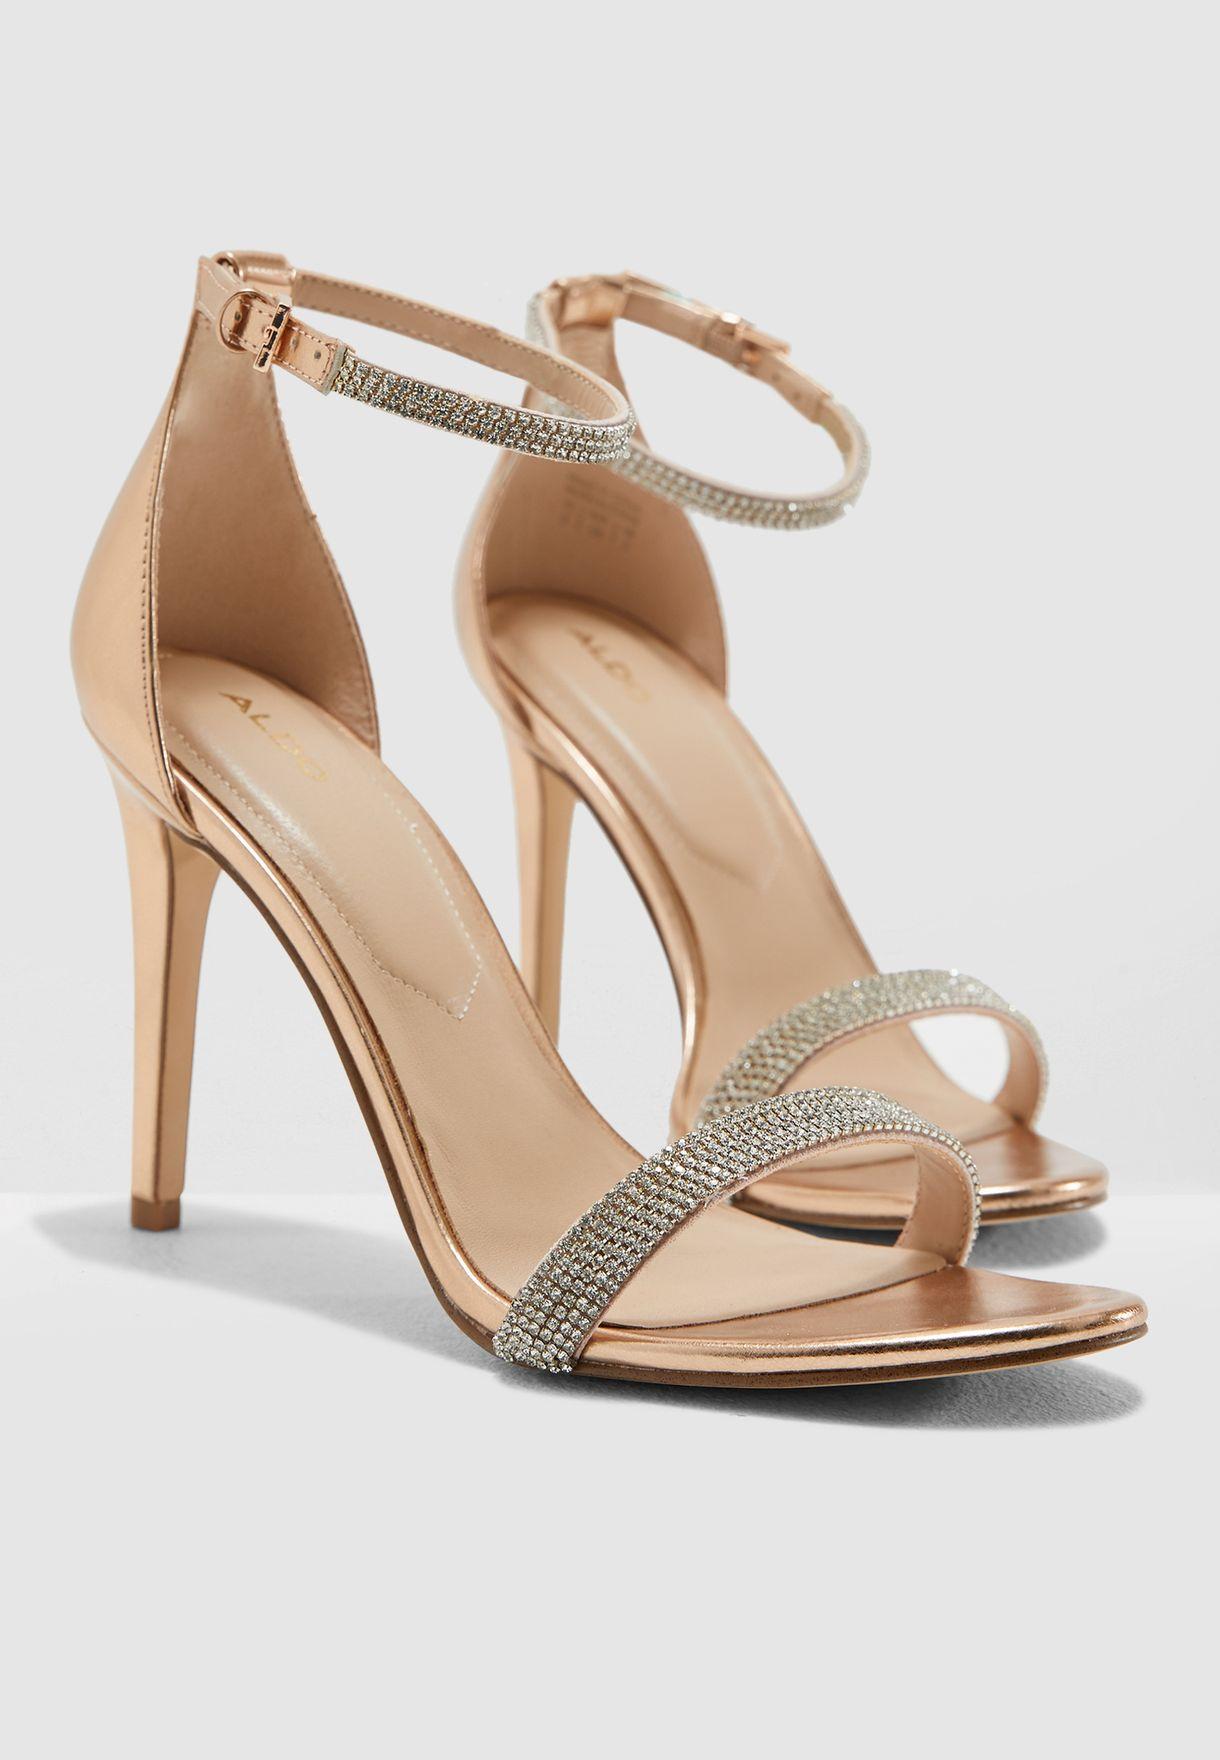 5899017e57 Shop Aldo rosegold Aroclya Sandal AROCLYA86 for Women in UAE ...